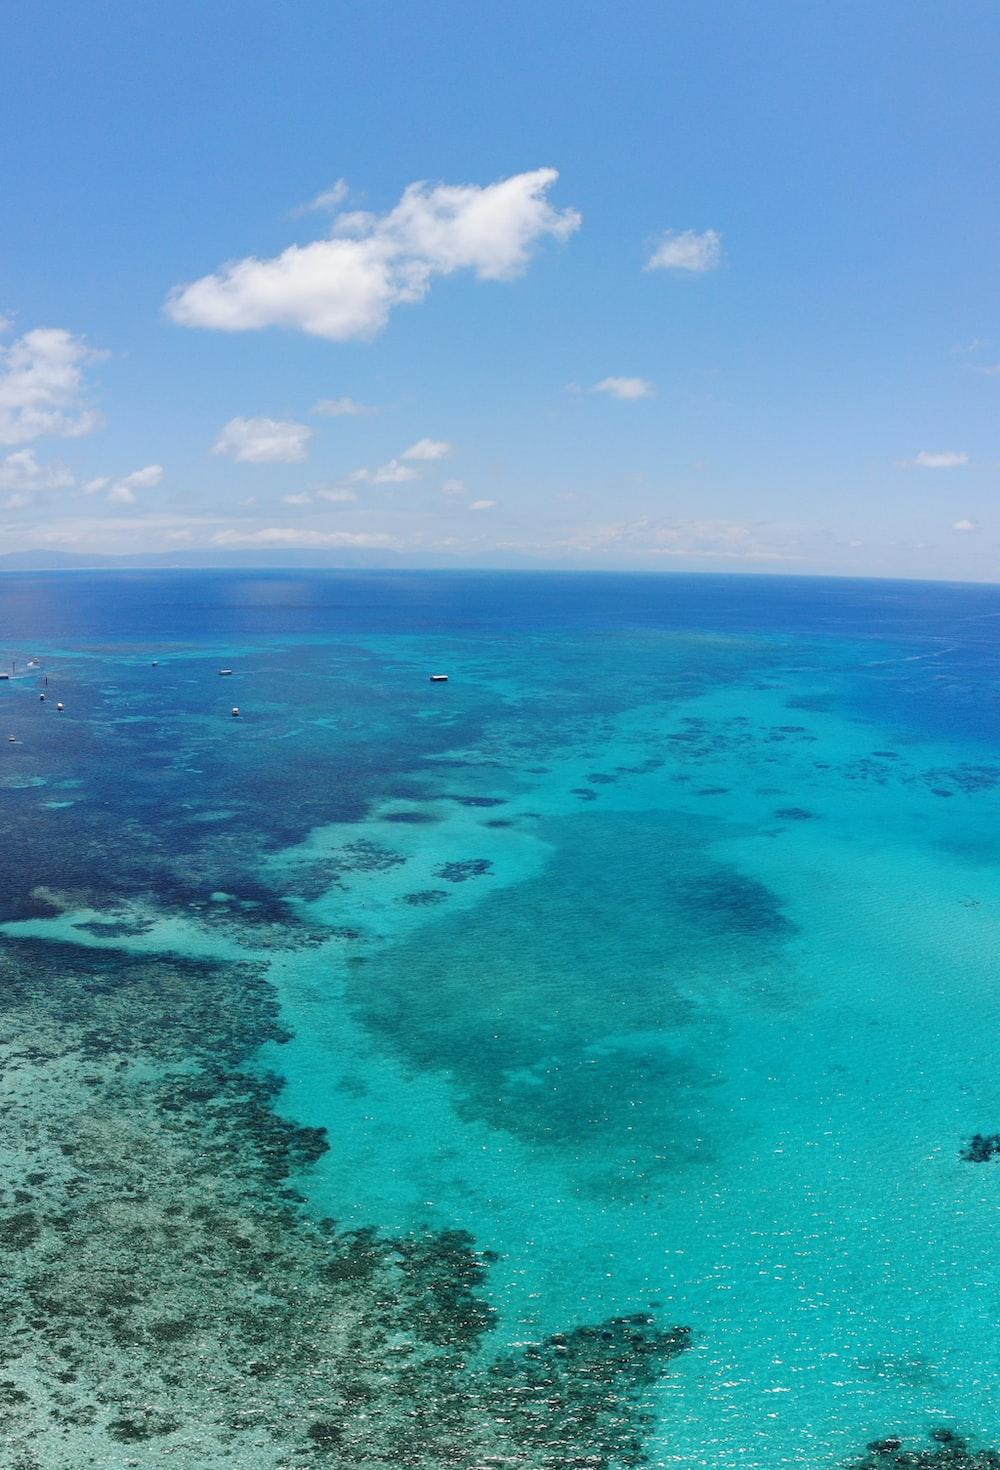 blue ocean photograph